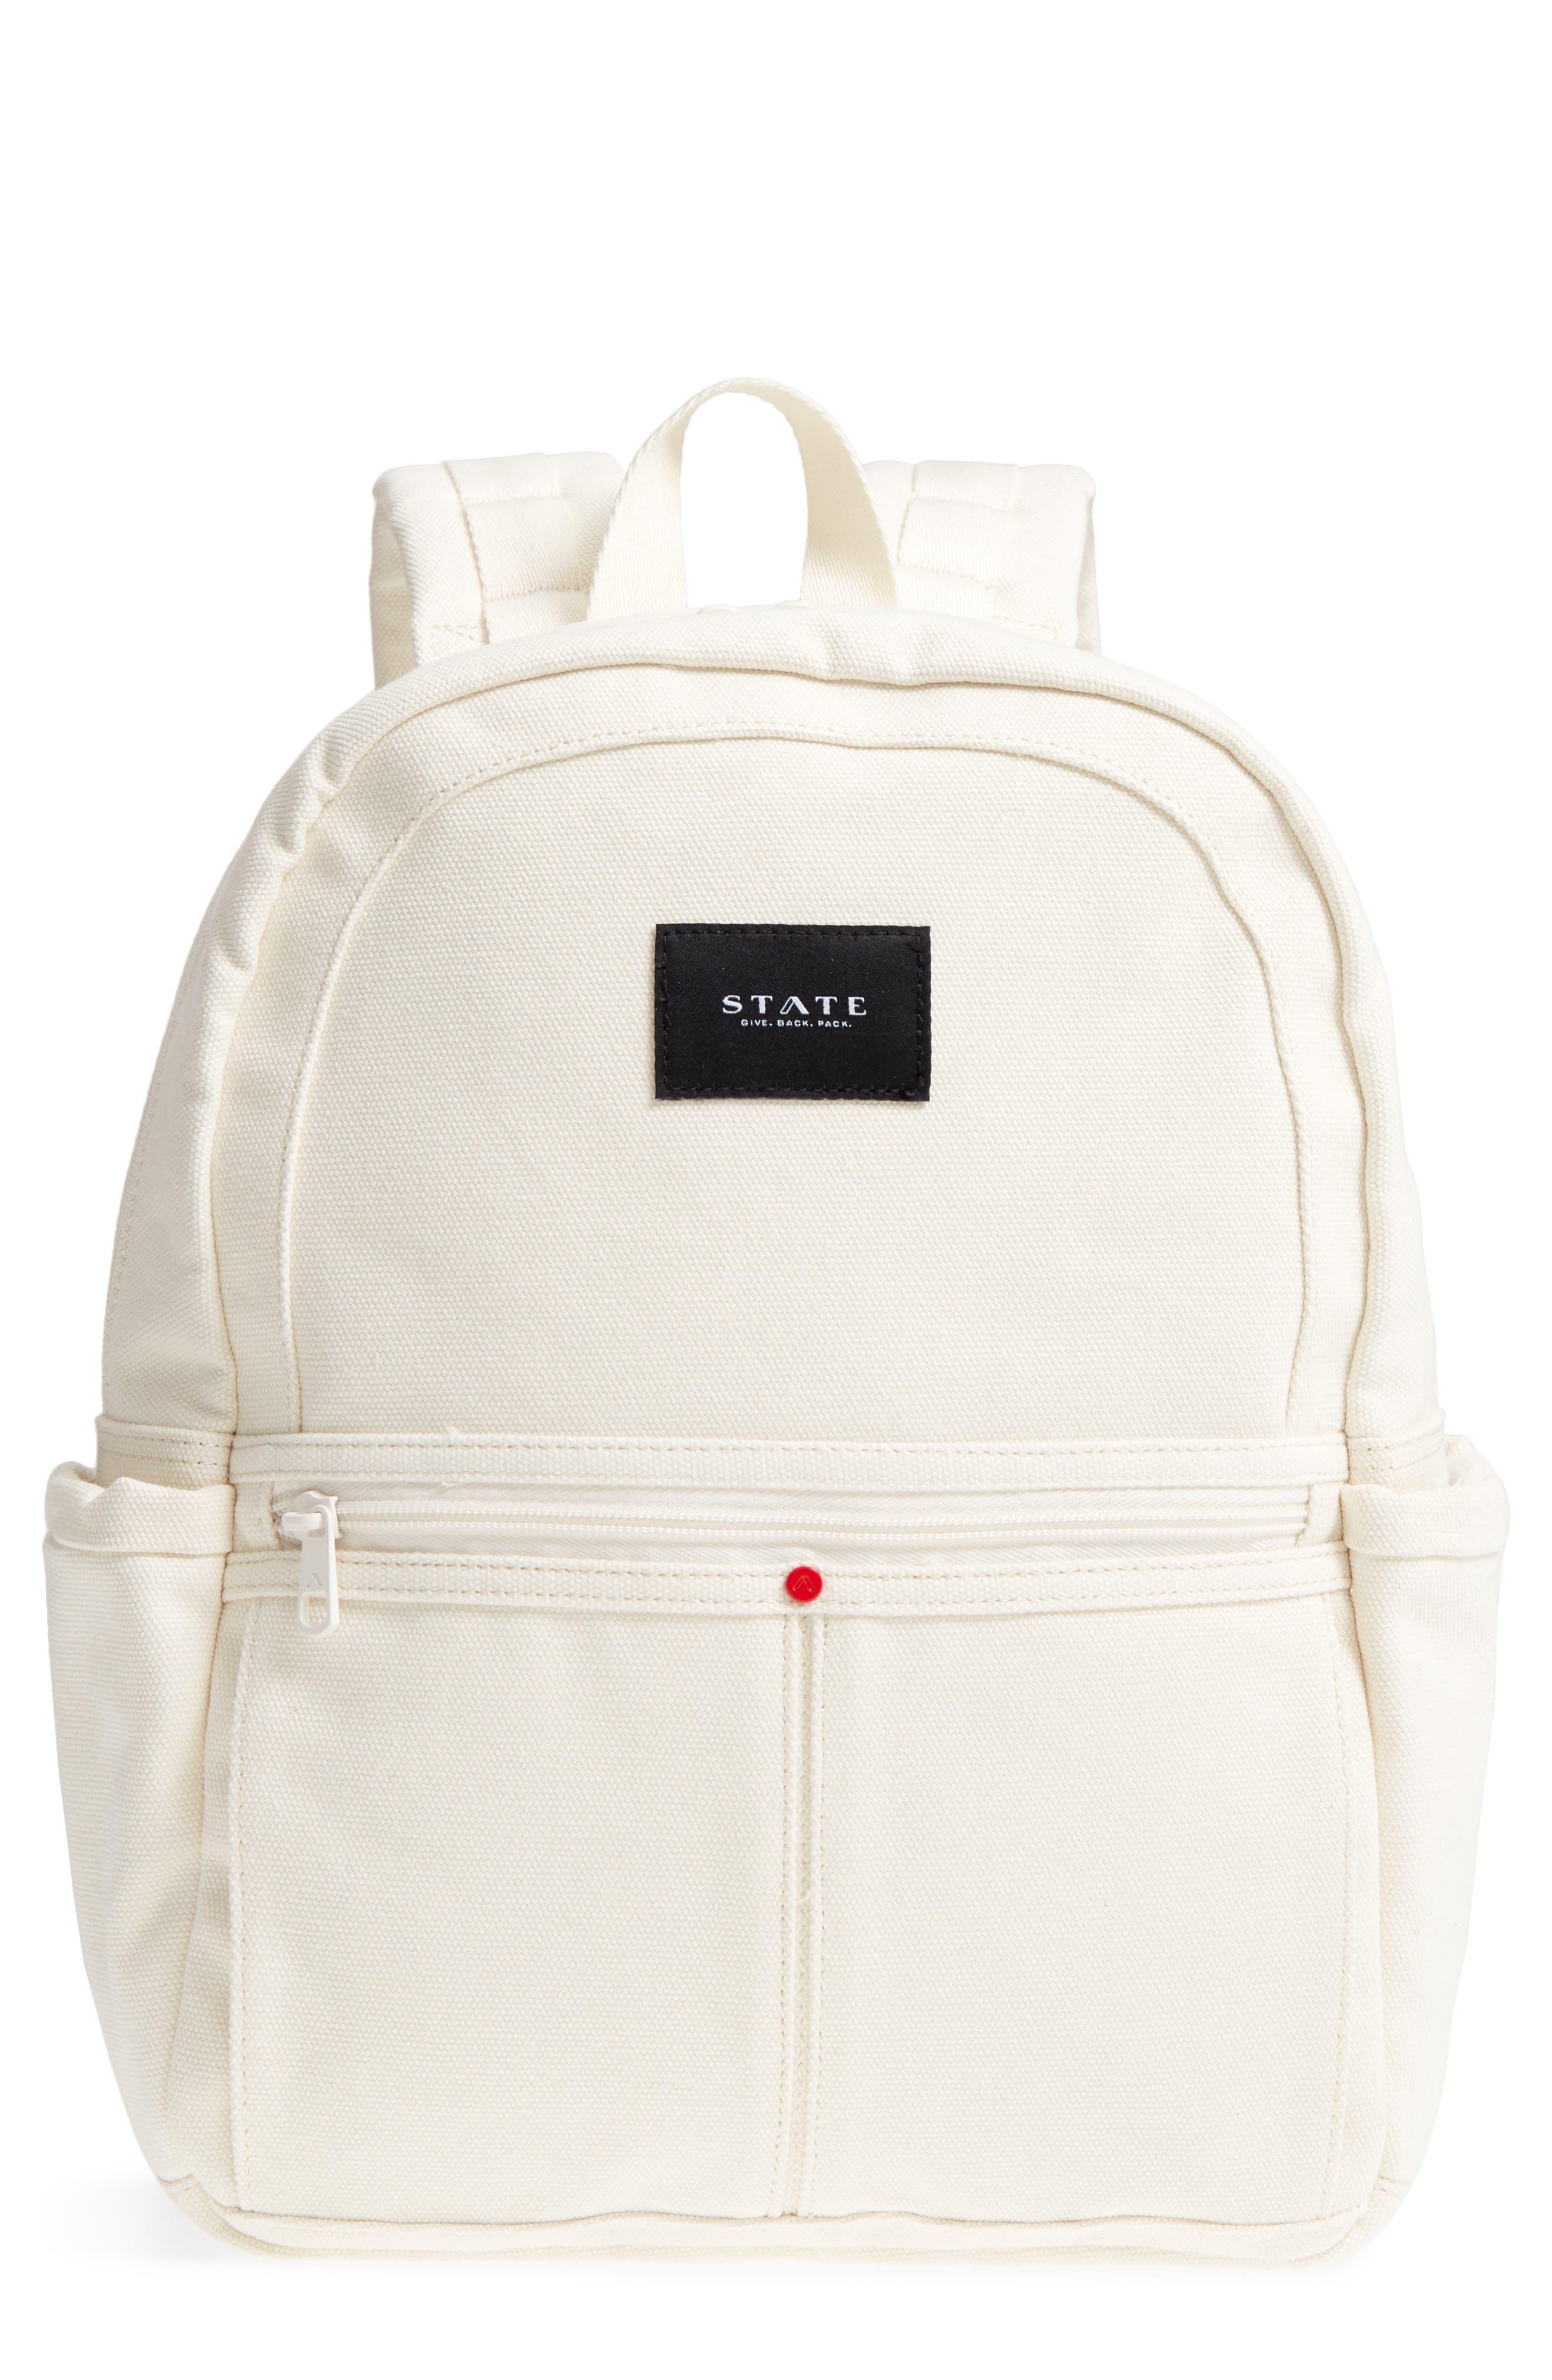 Kensington Kane Canvas Backpack,                         Main,                         color, 900